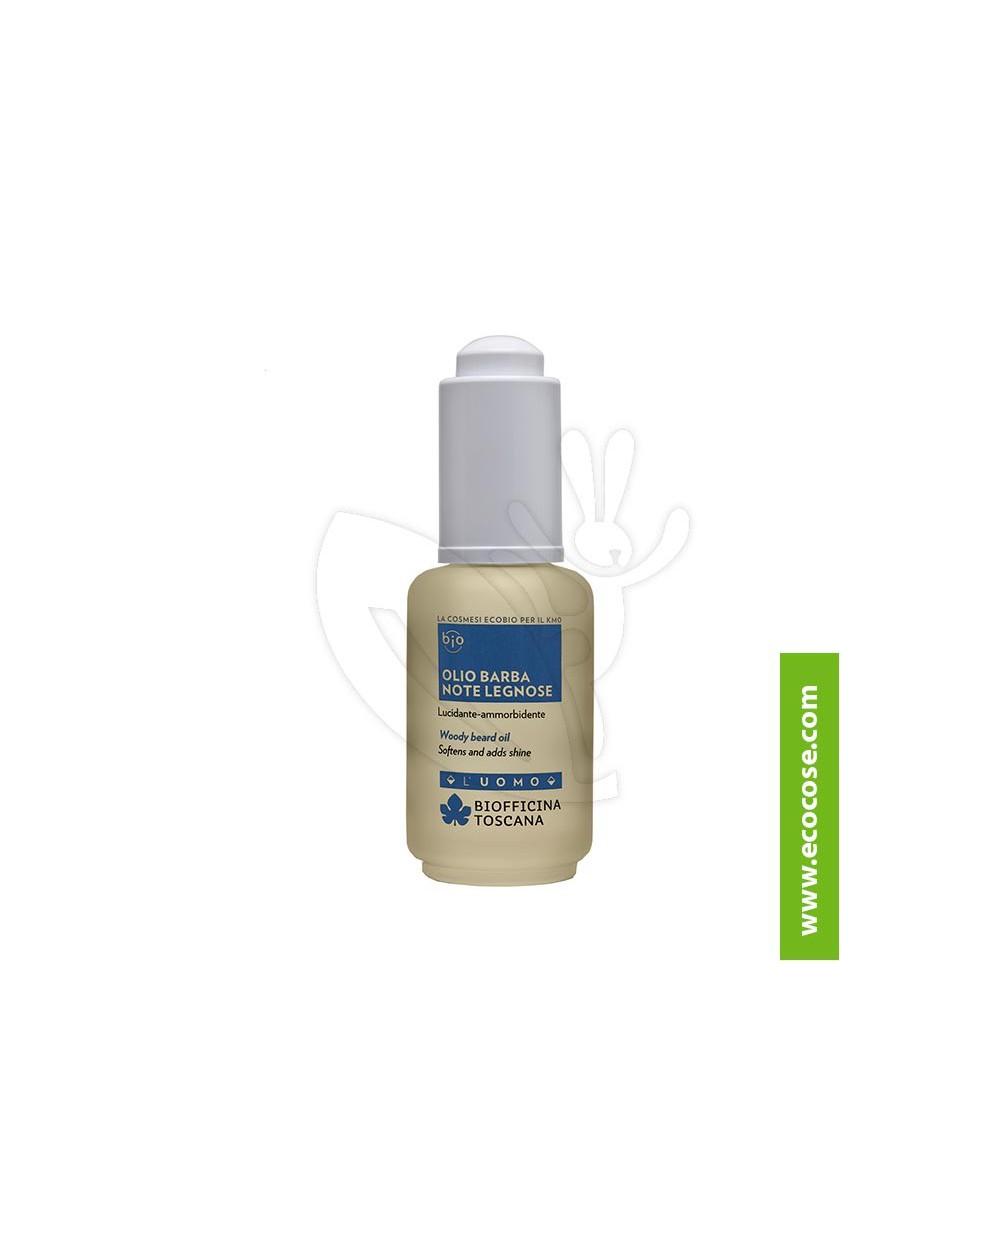 Biofficina Toscana - UOMO - Olio Barba note LEGNOSE